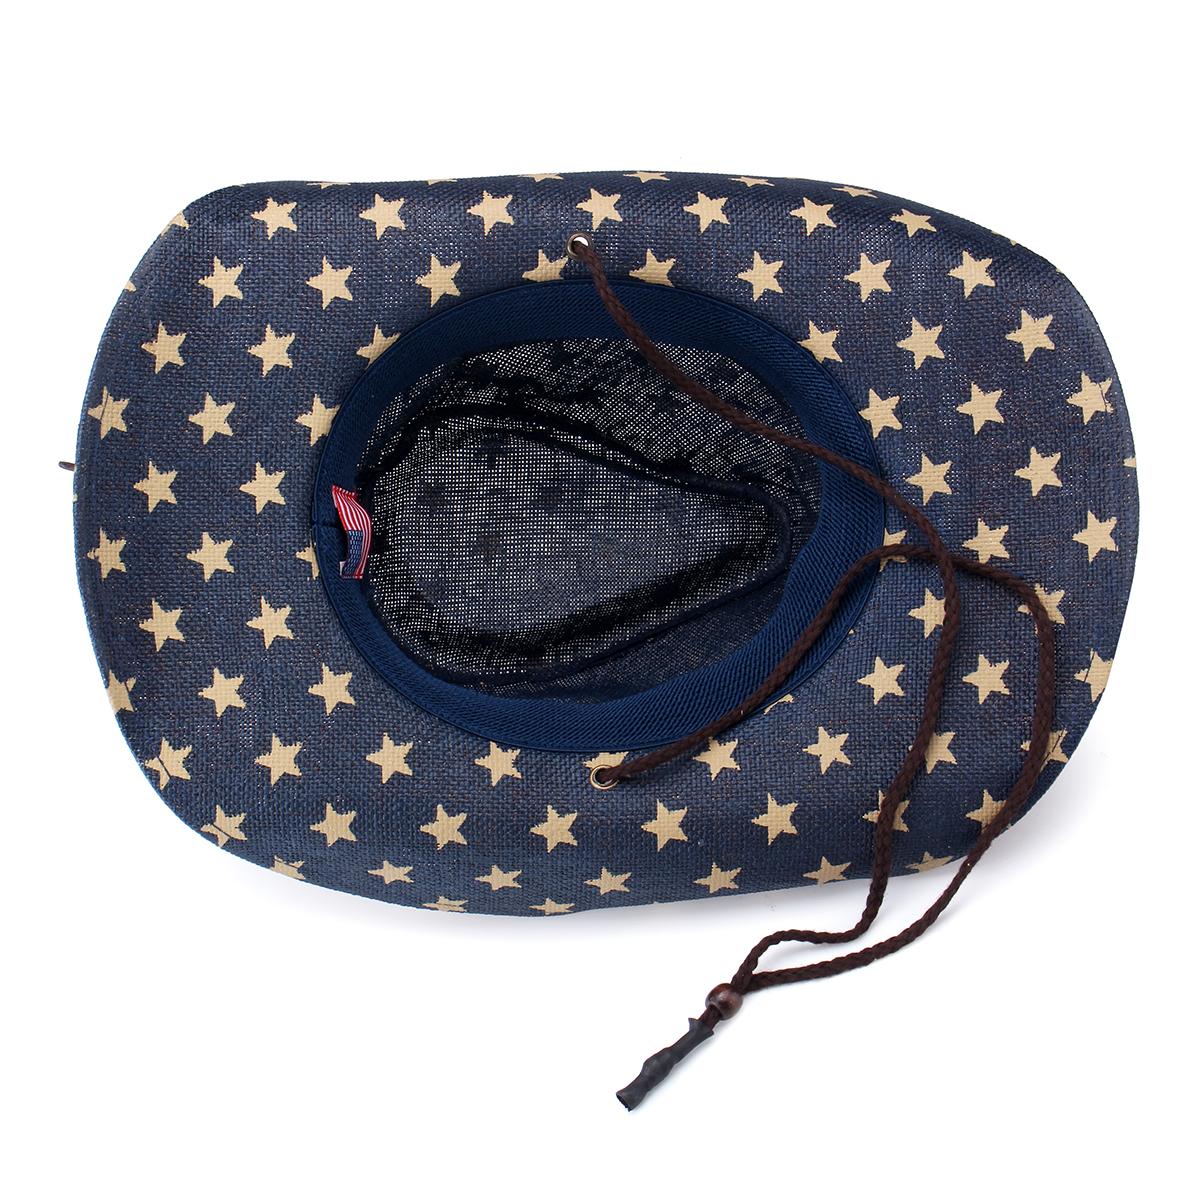 c417e9495b0 Women Men Straw Western Sombrero Cowboy Hats Cowgirl Caps American ...